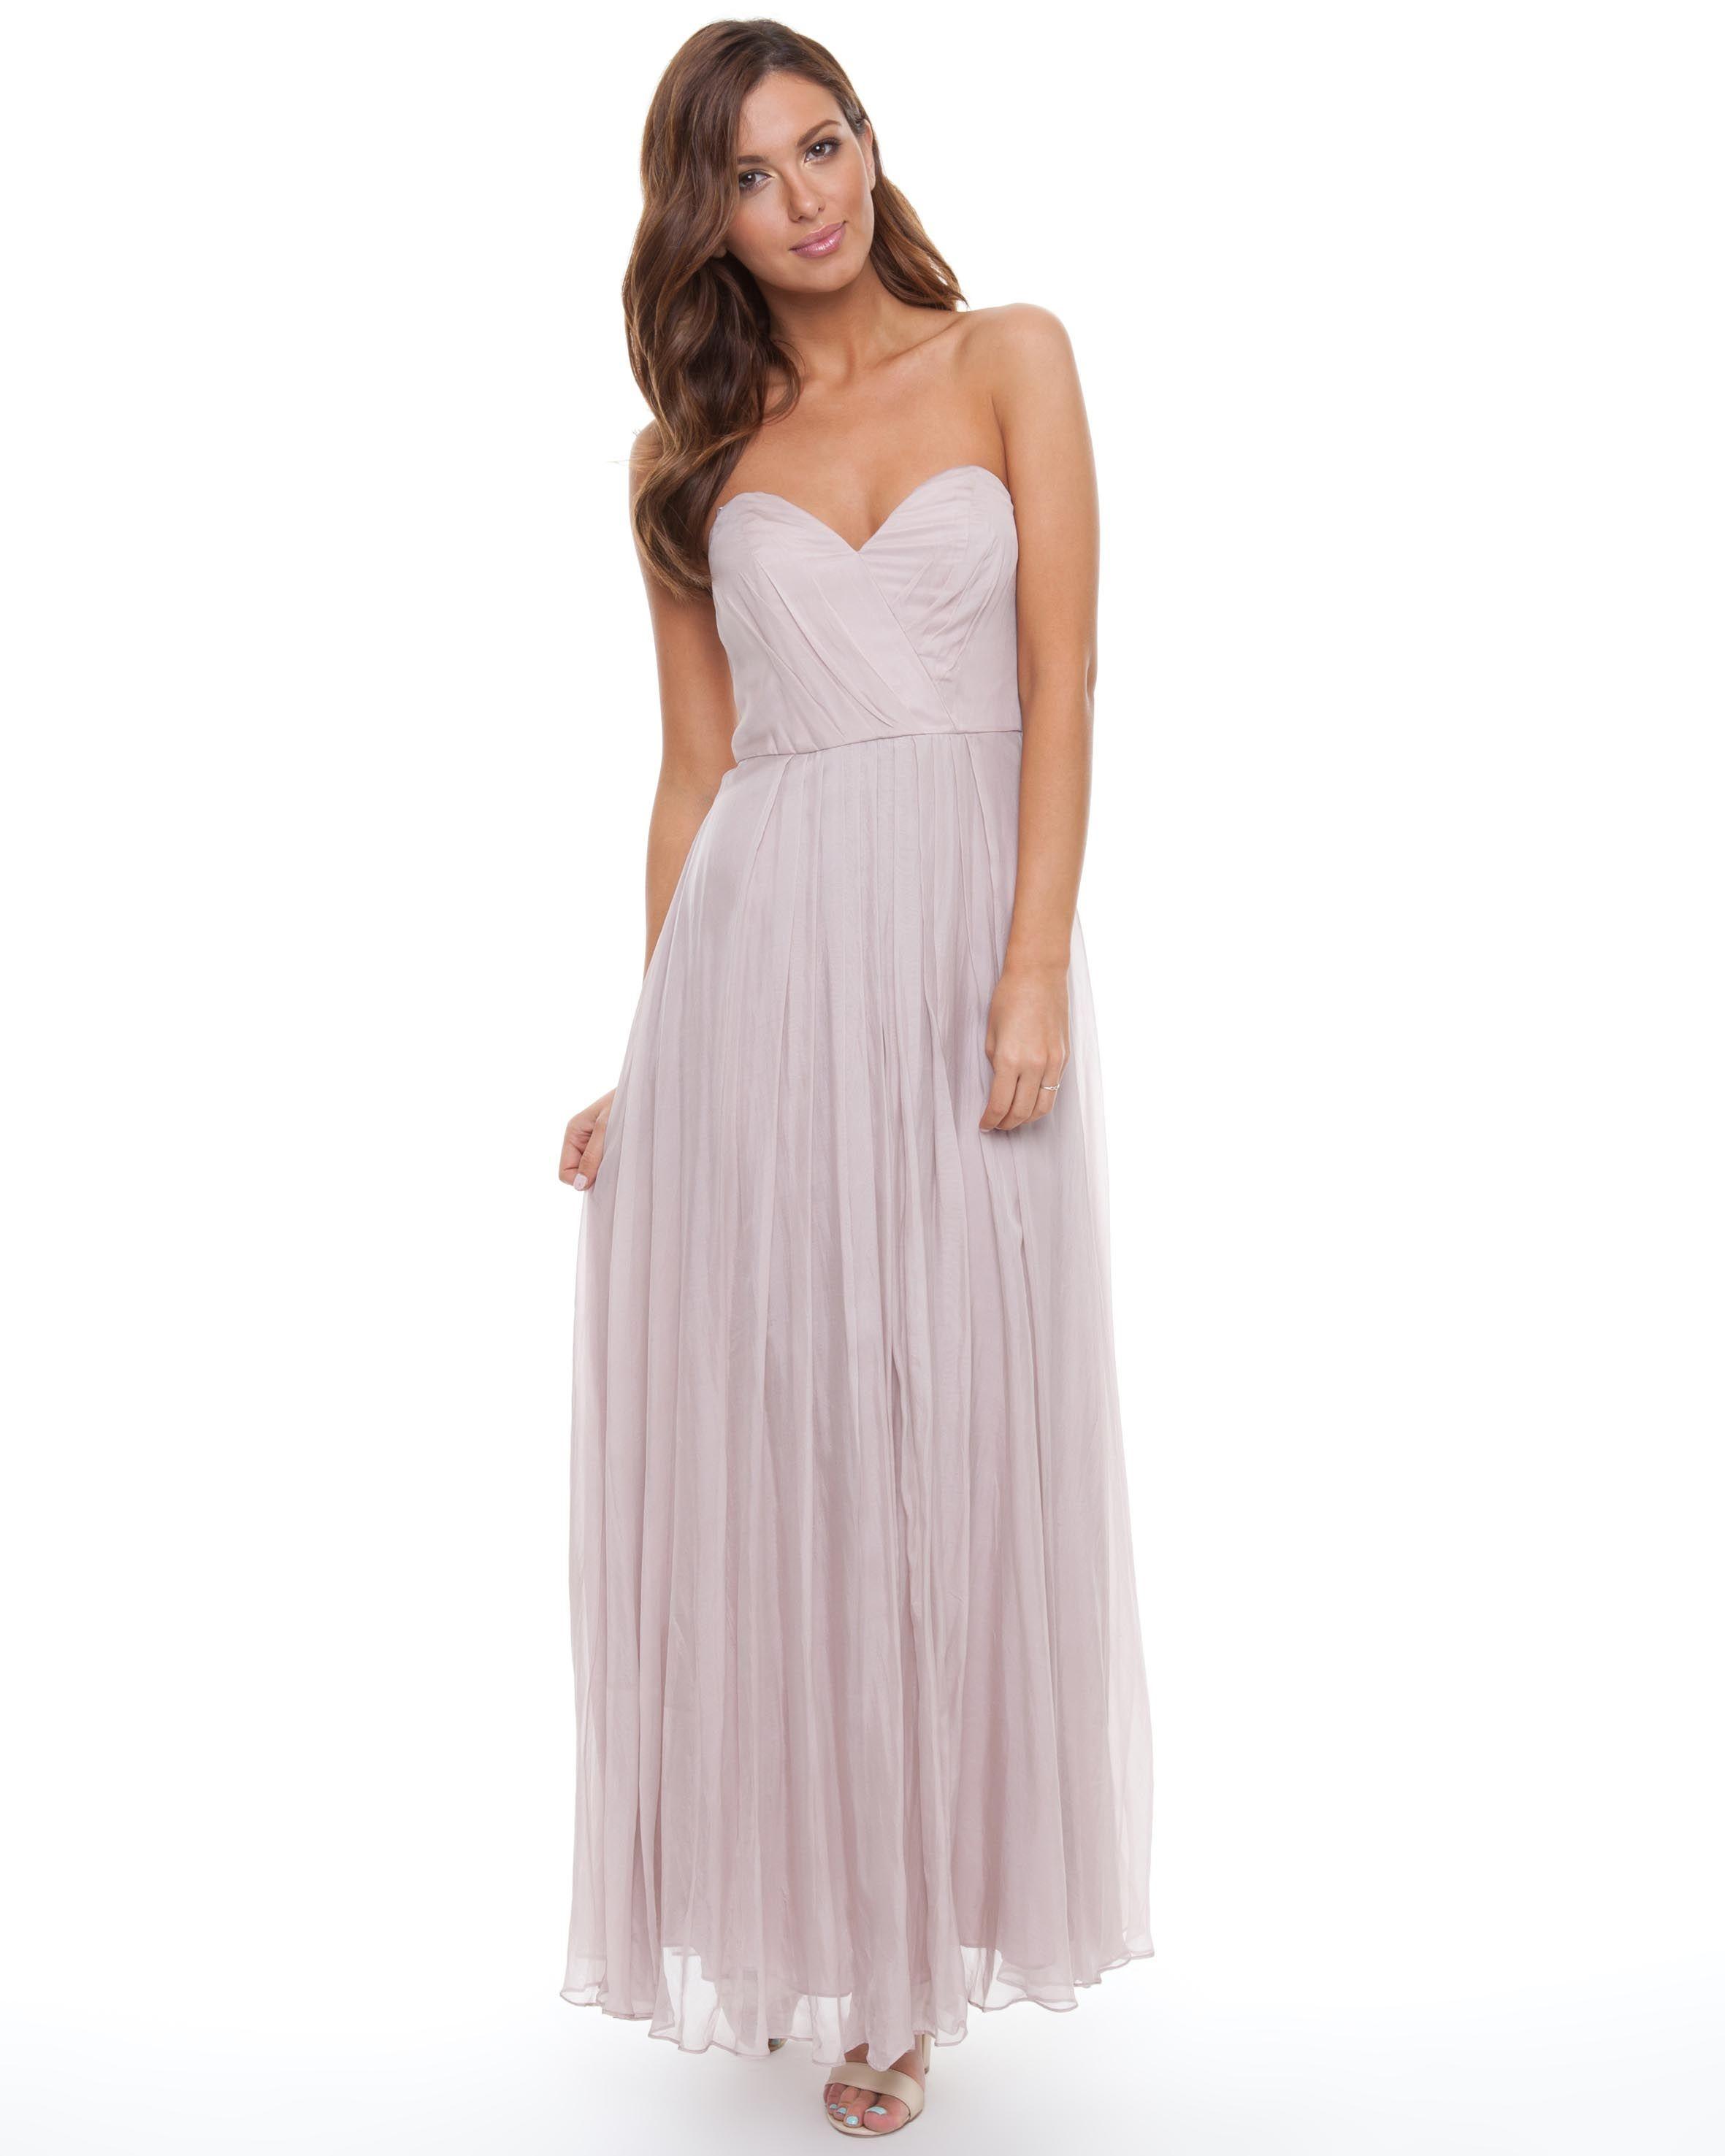 Wunderbar Maxi Bridesmaid Dresses Australia Ideen - Brautkleider ...